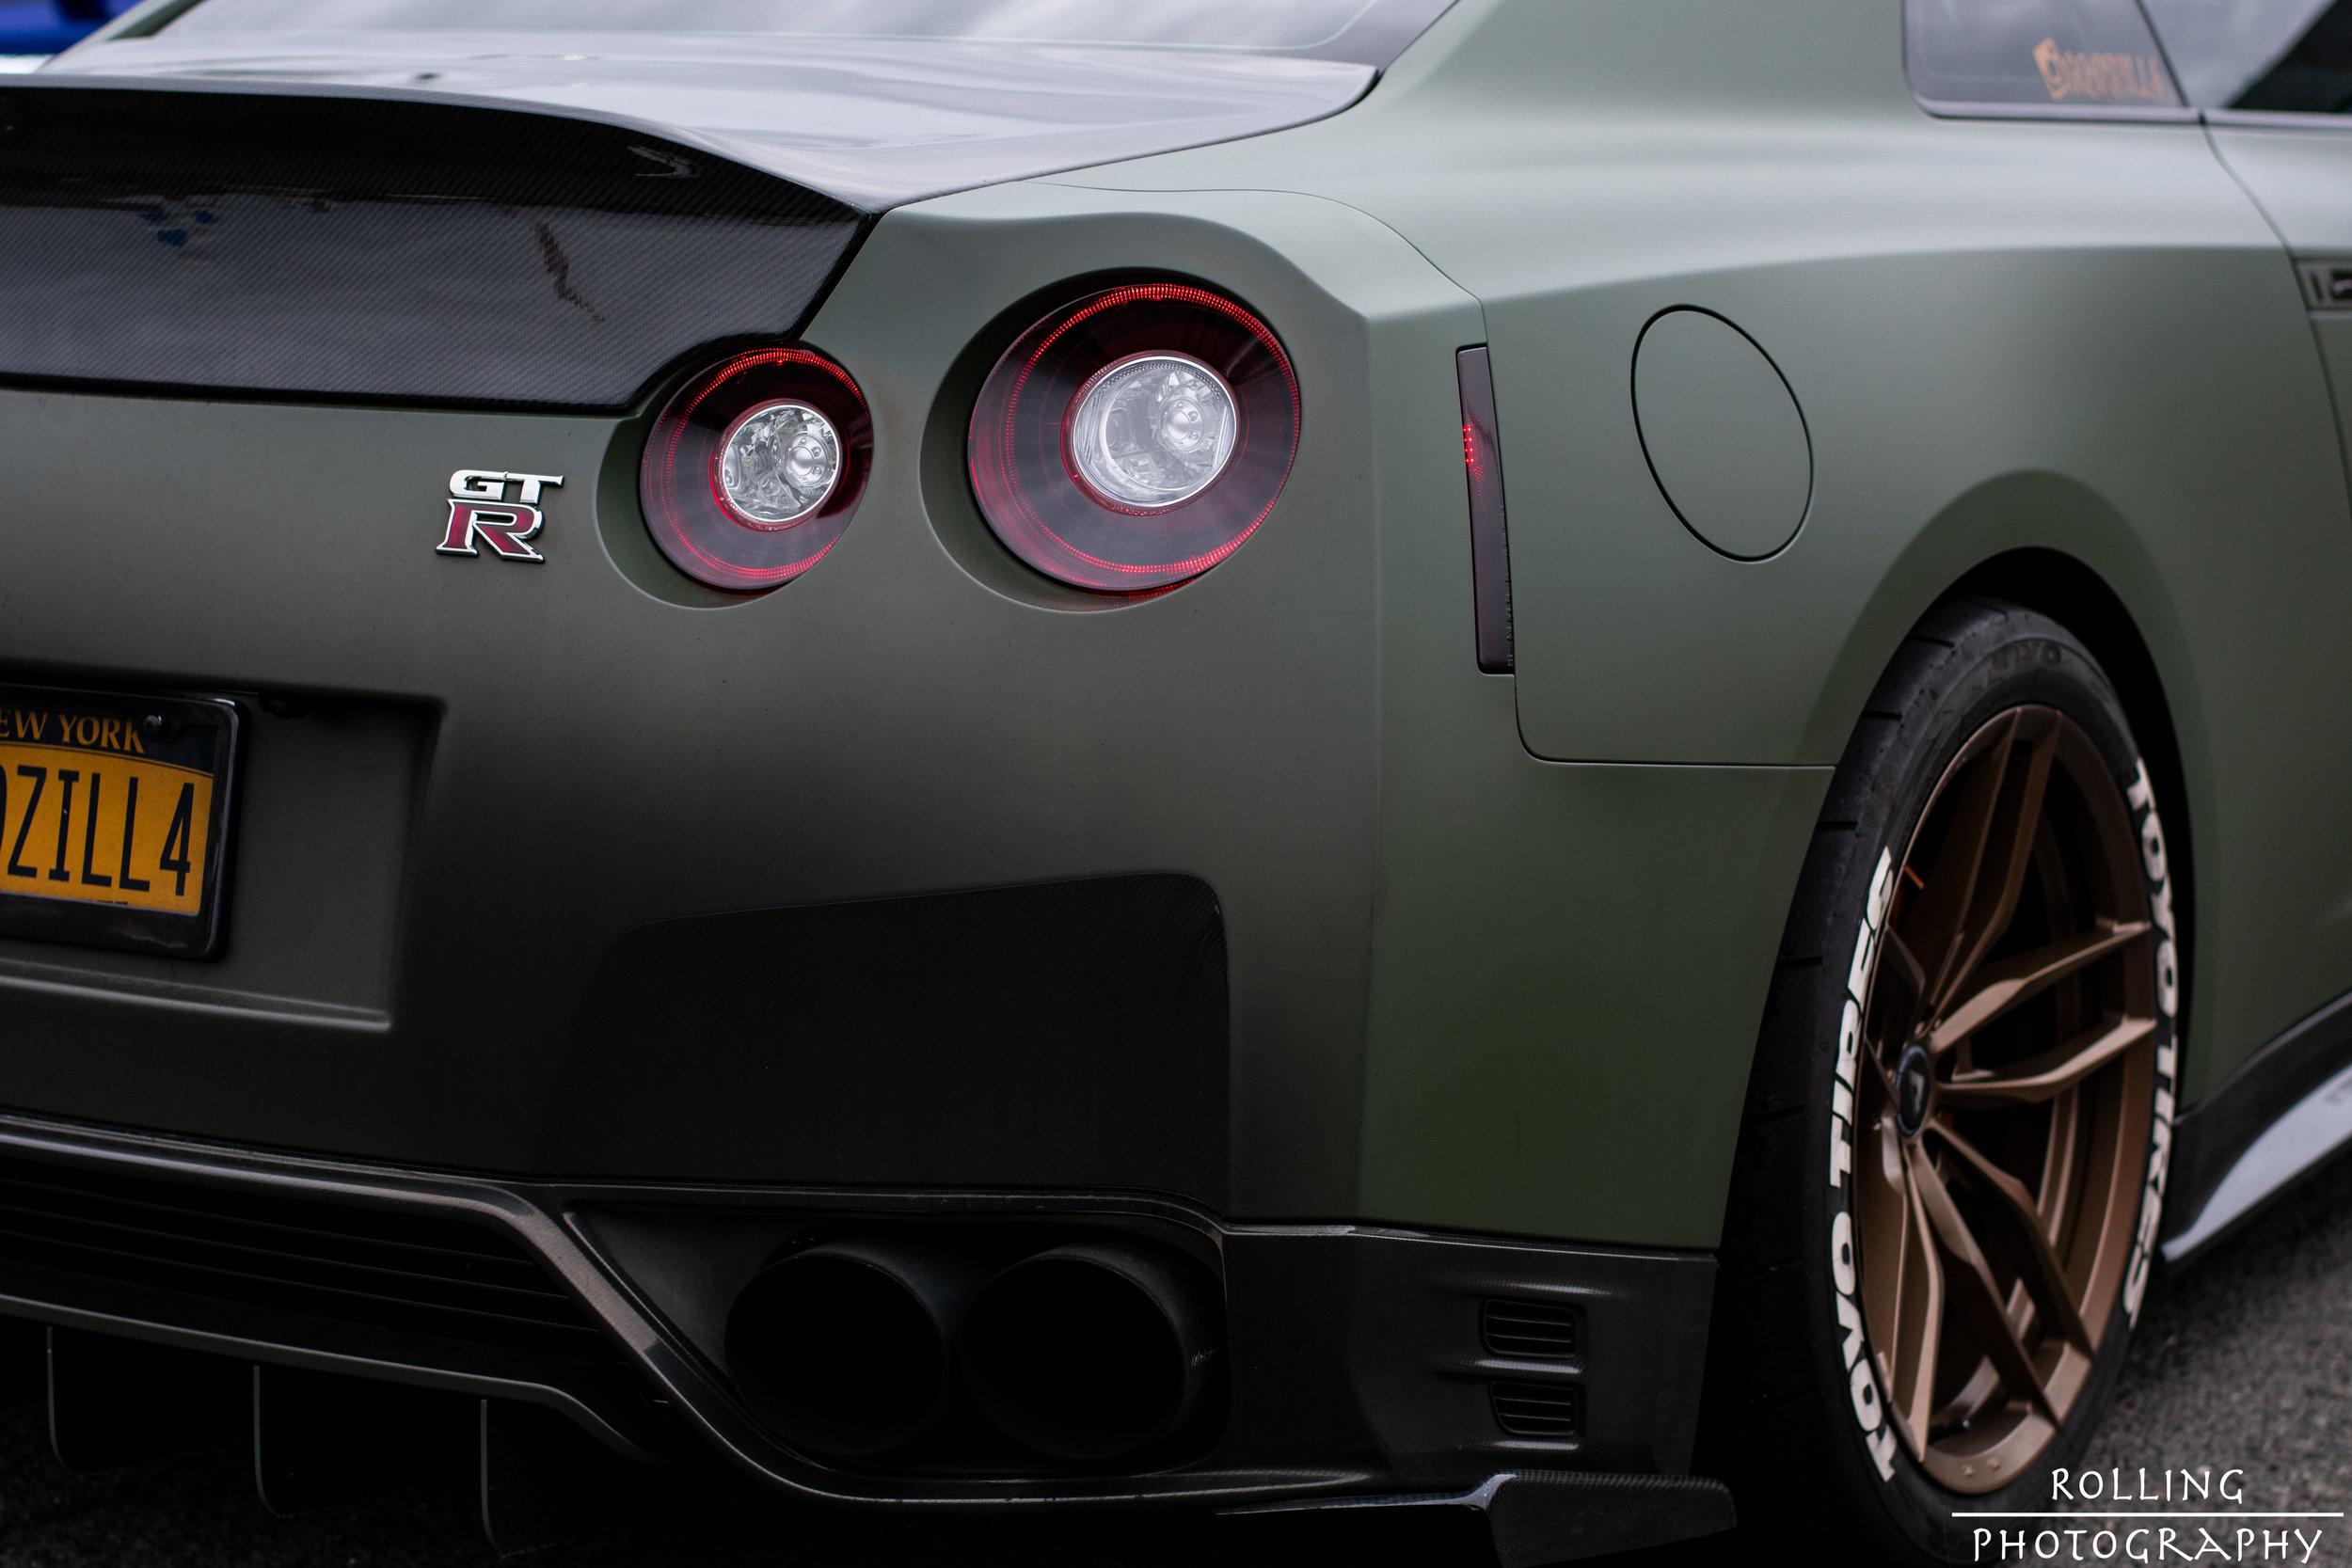 2016 Nissan GTR (R35)  @gqdzill4   ISO 200, 50mm, f / 3.5 Shutter Speed 1/1000